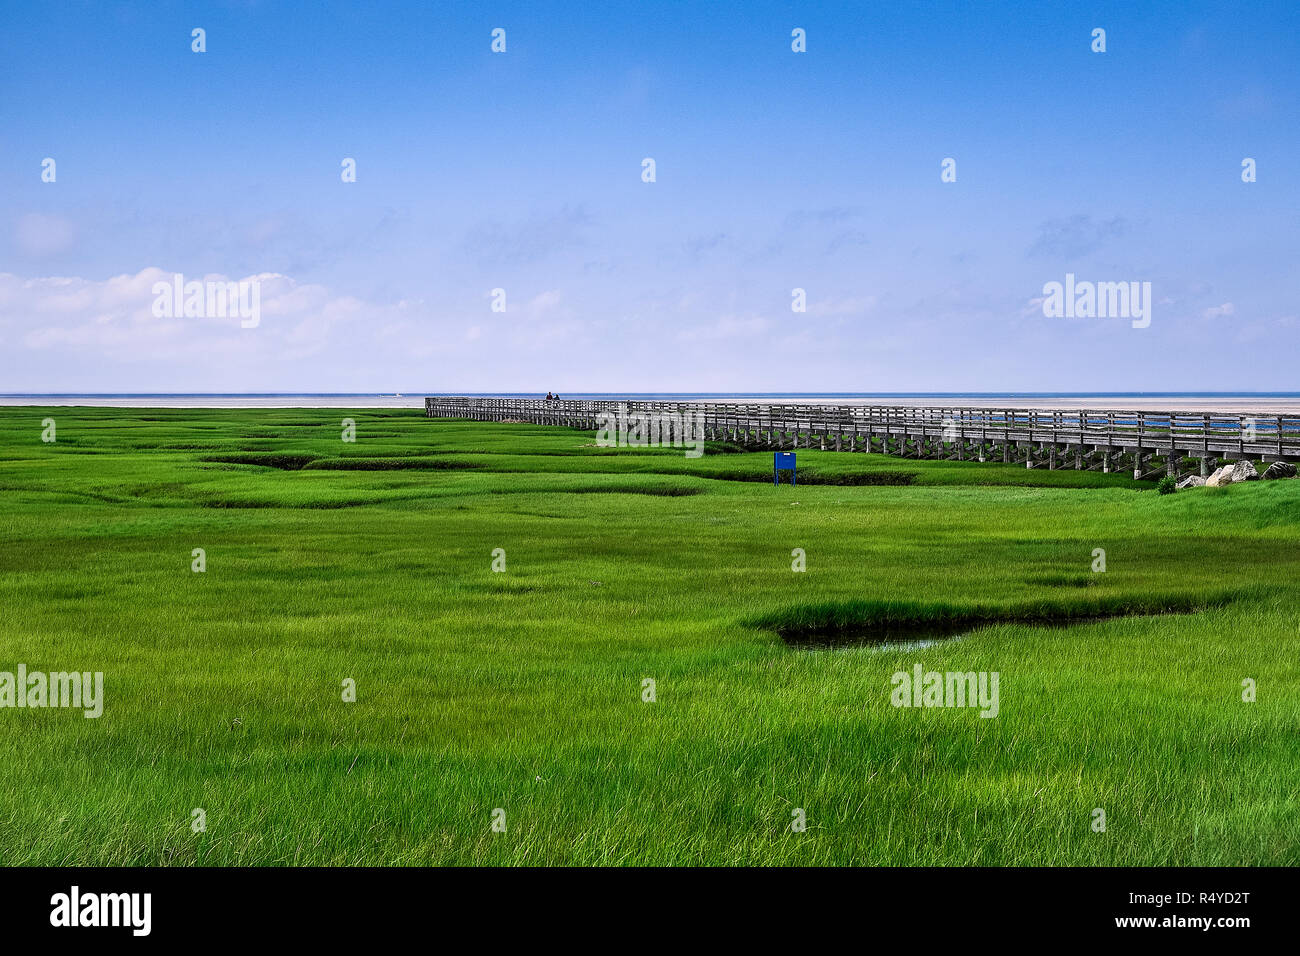 Salt marsh boardwalk at Gray's Beach, Yarmouth, Cape Cod, Massachusetts, USA. - Stock Image